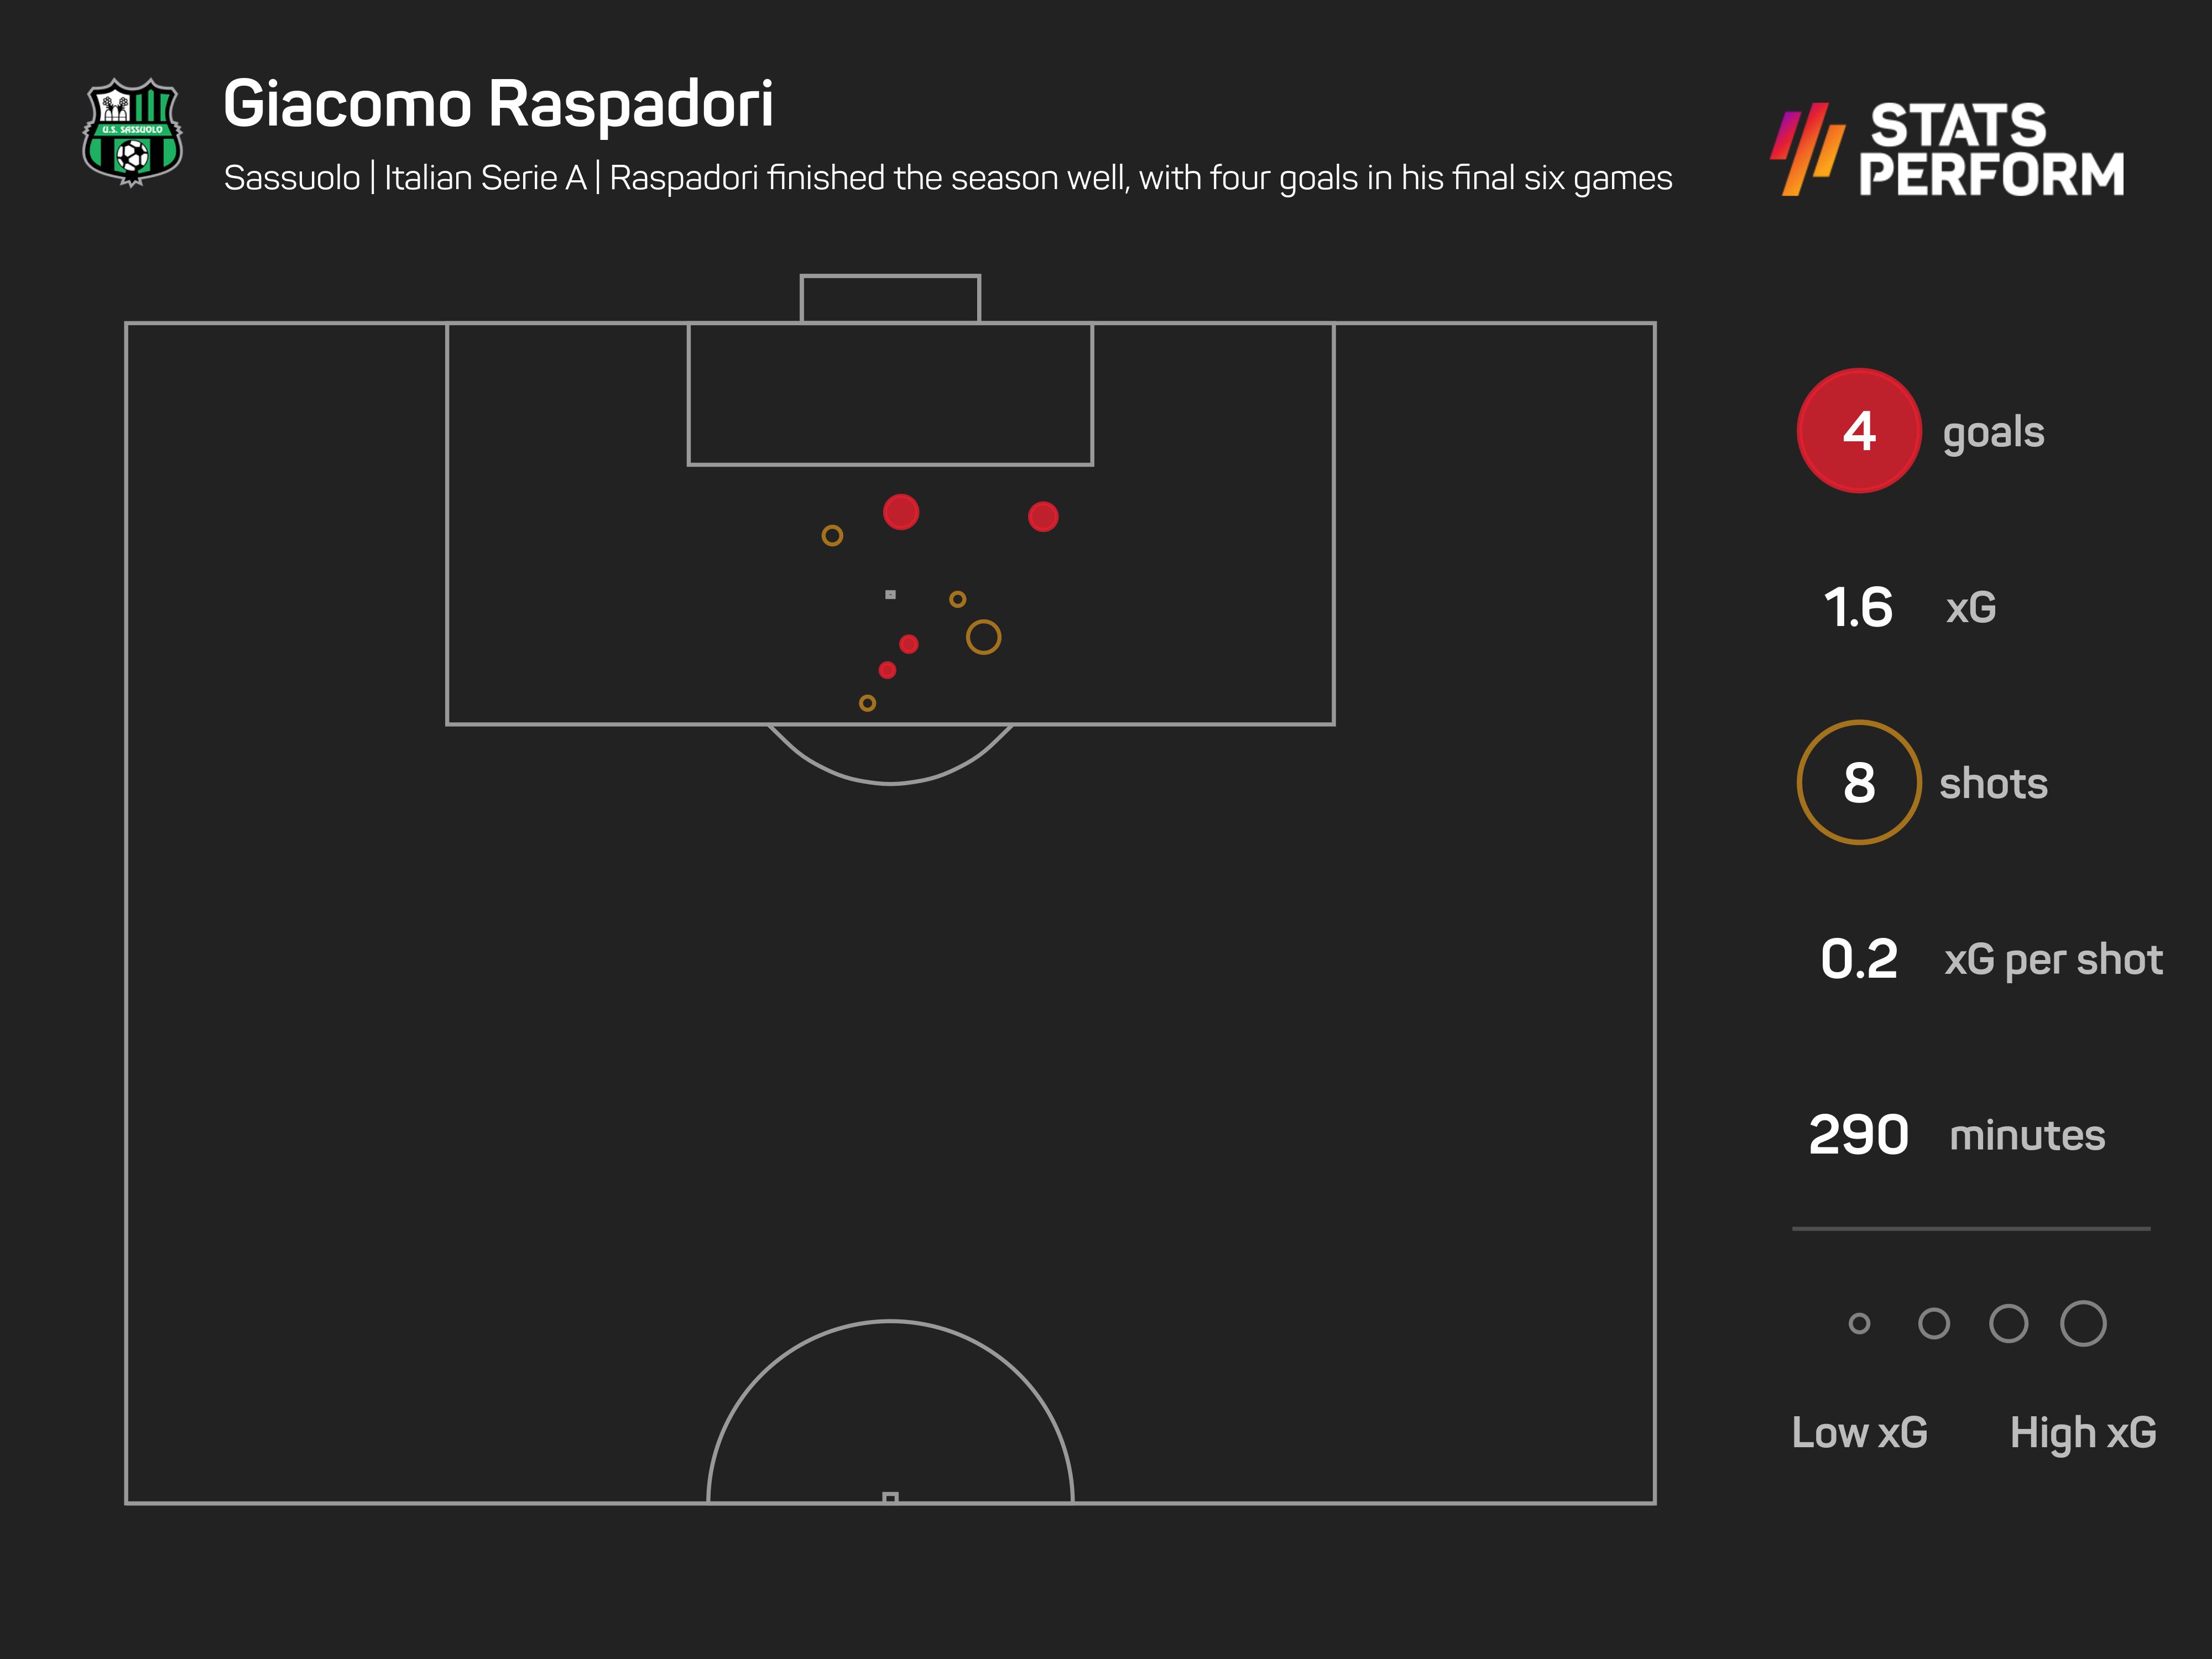 Giacomo Raspadori finished the season impressively